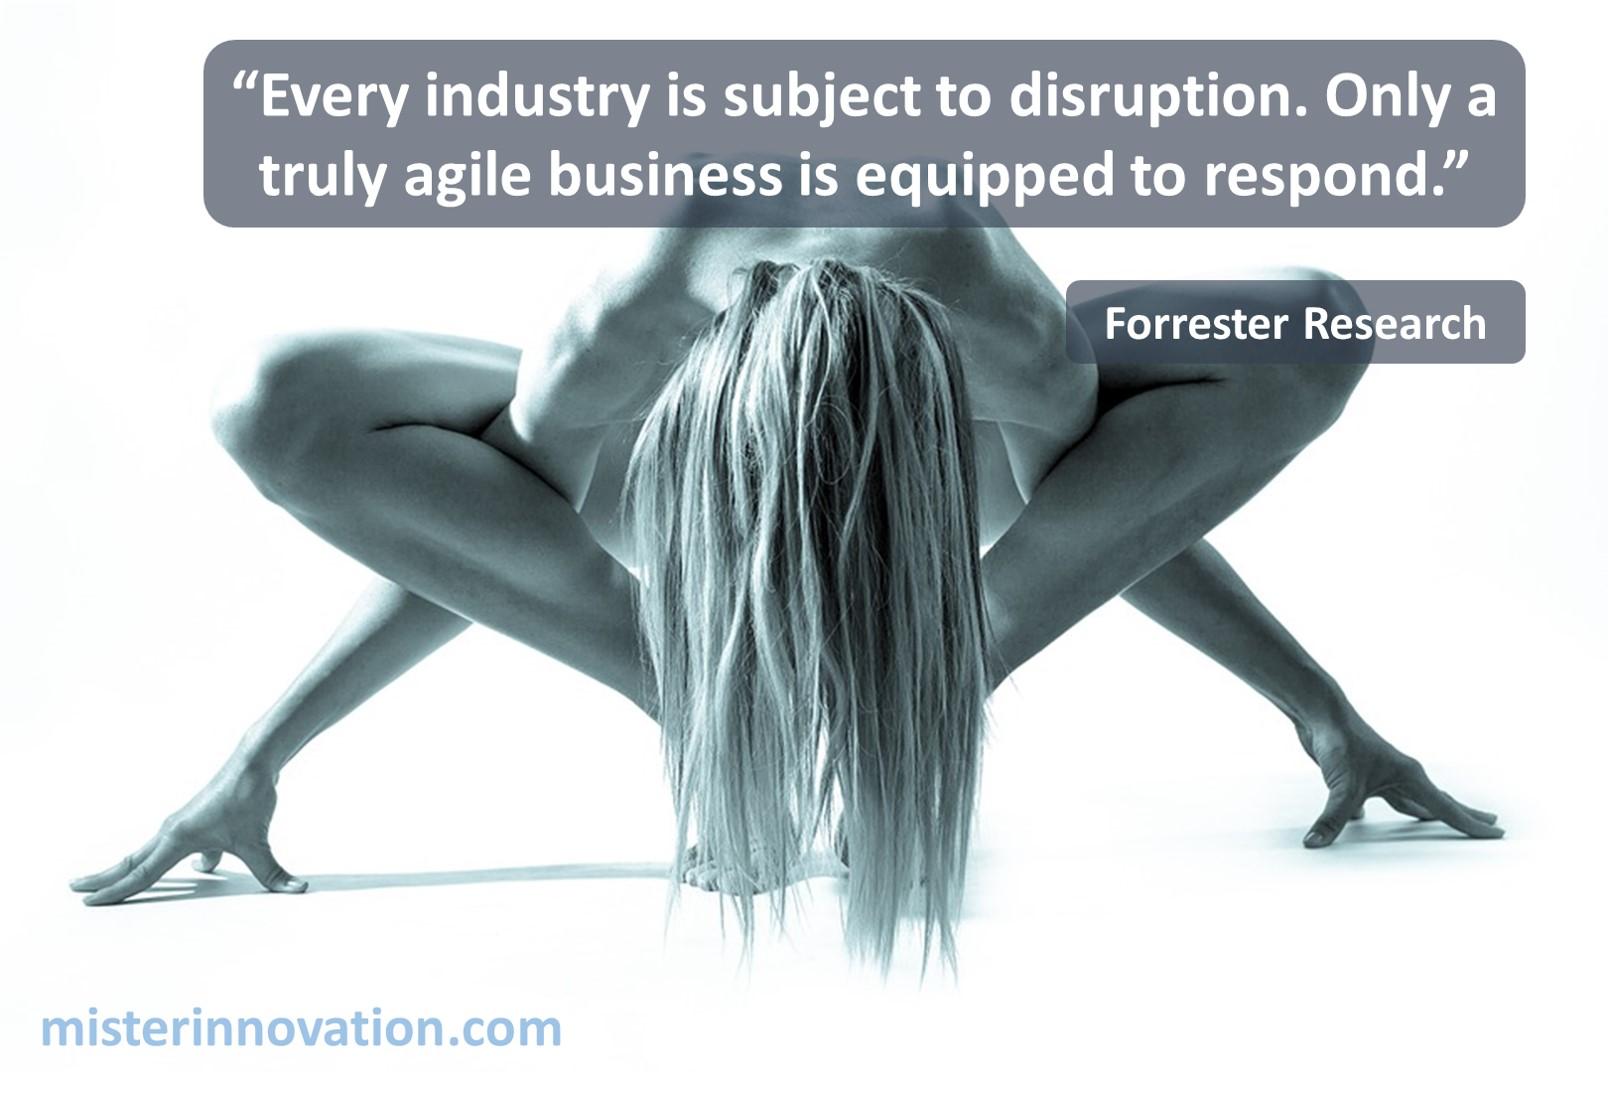 Forrester Agile Disruption